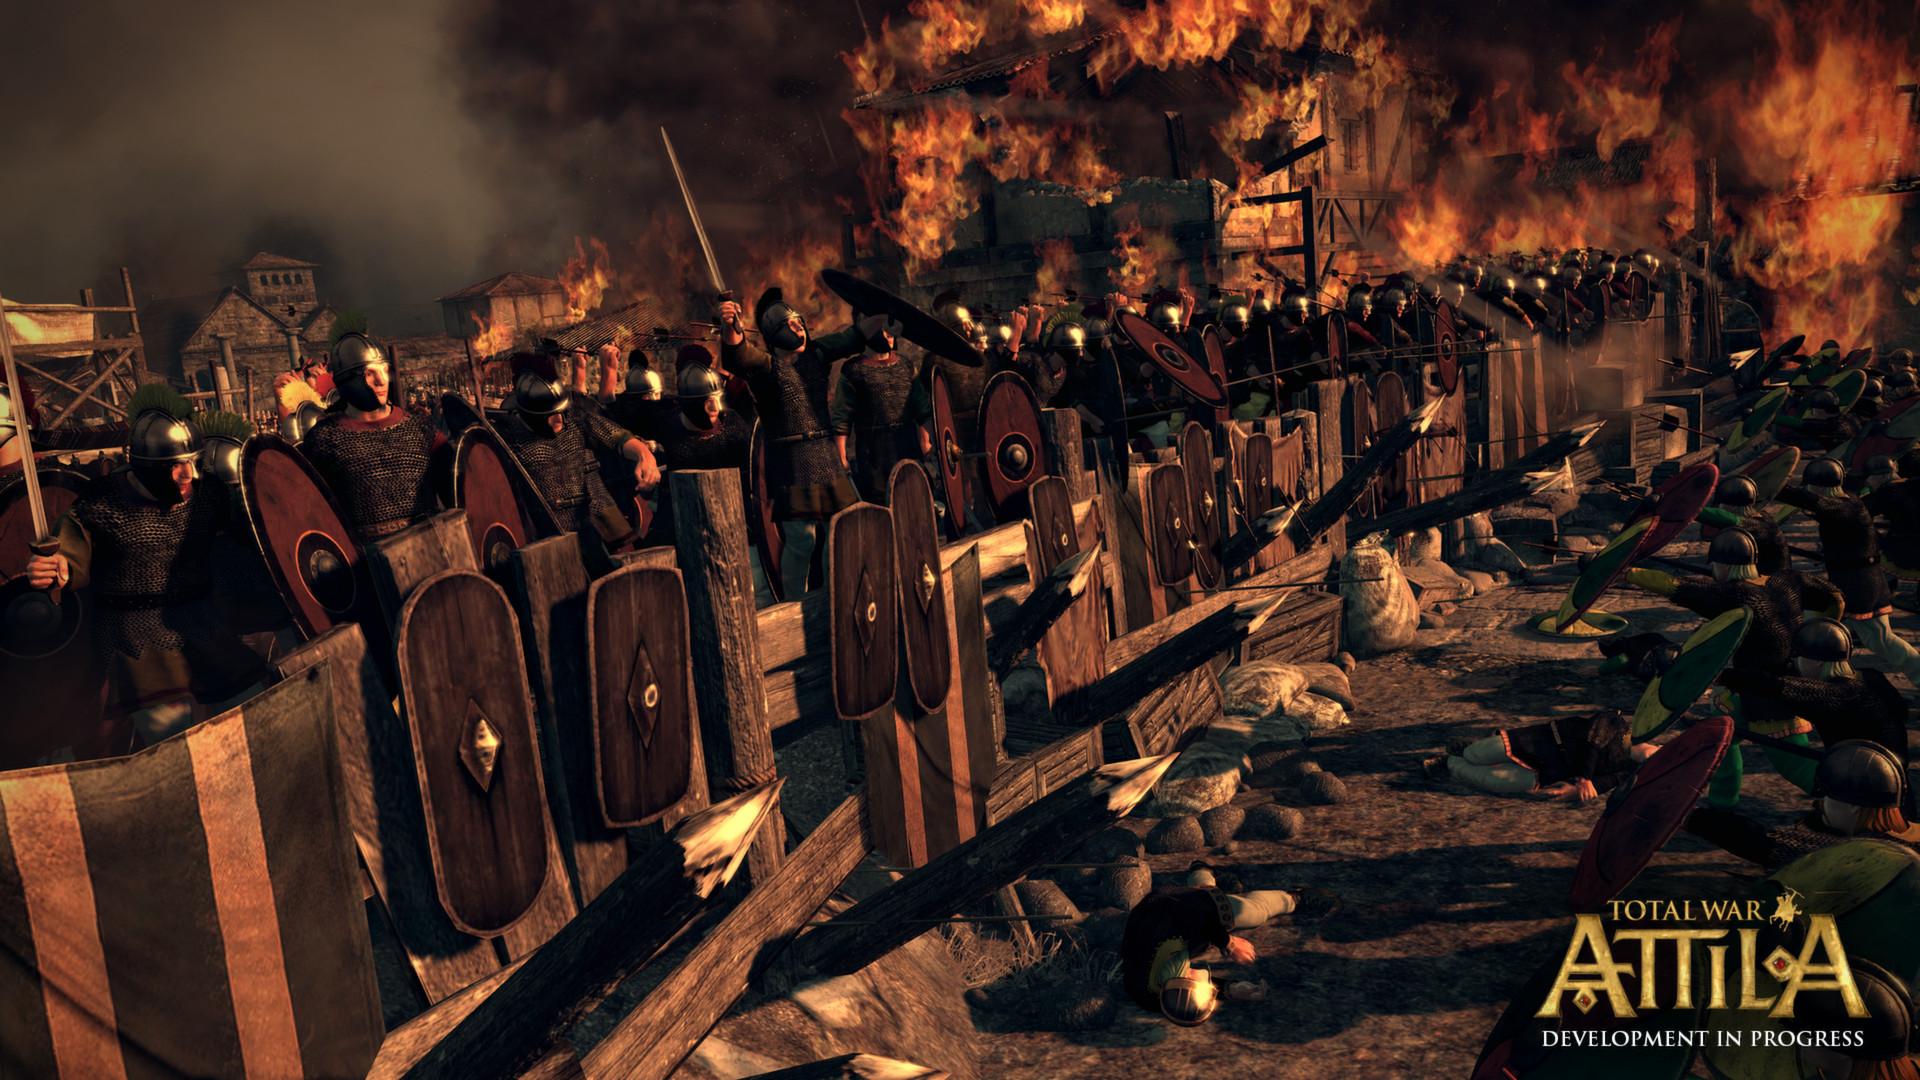 Total War Attila ESPAÑOL Full PC Incluye DLC (CPY) + REPACK 2 DVD5 (JPW) 6